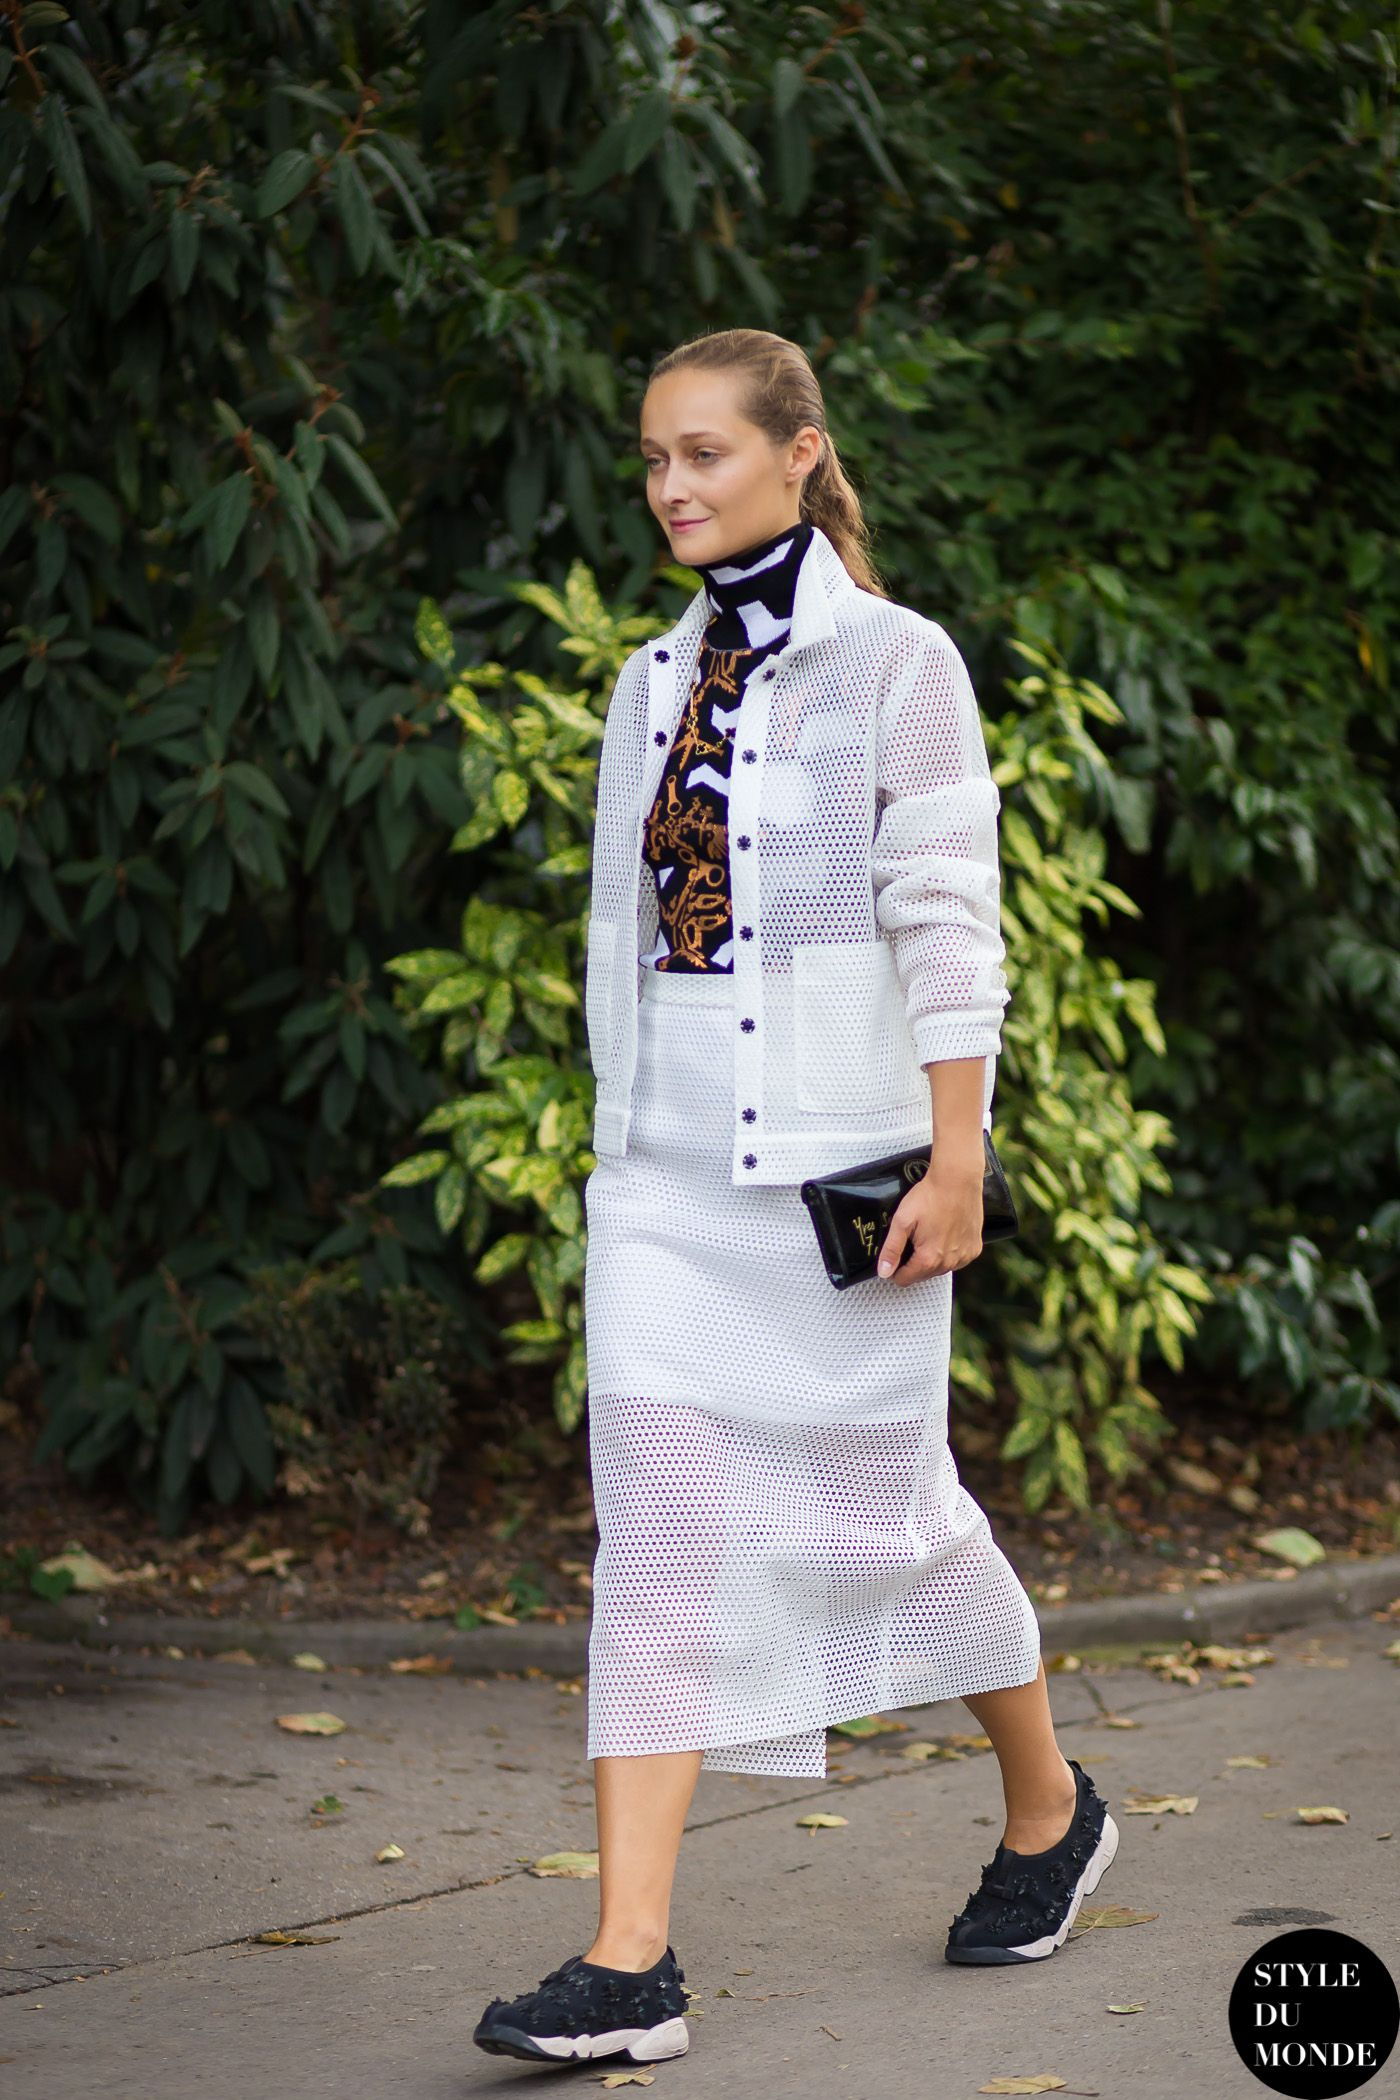 Daria Shapovalova Street Style Street Fashion Streetsnaps by STYLEDUMONDE Street Style Fashion Blog